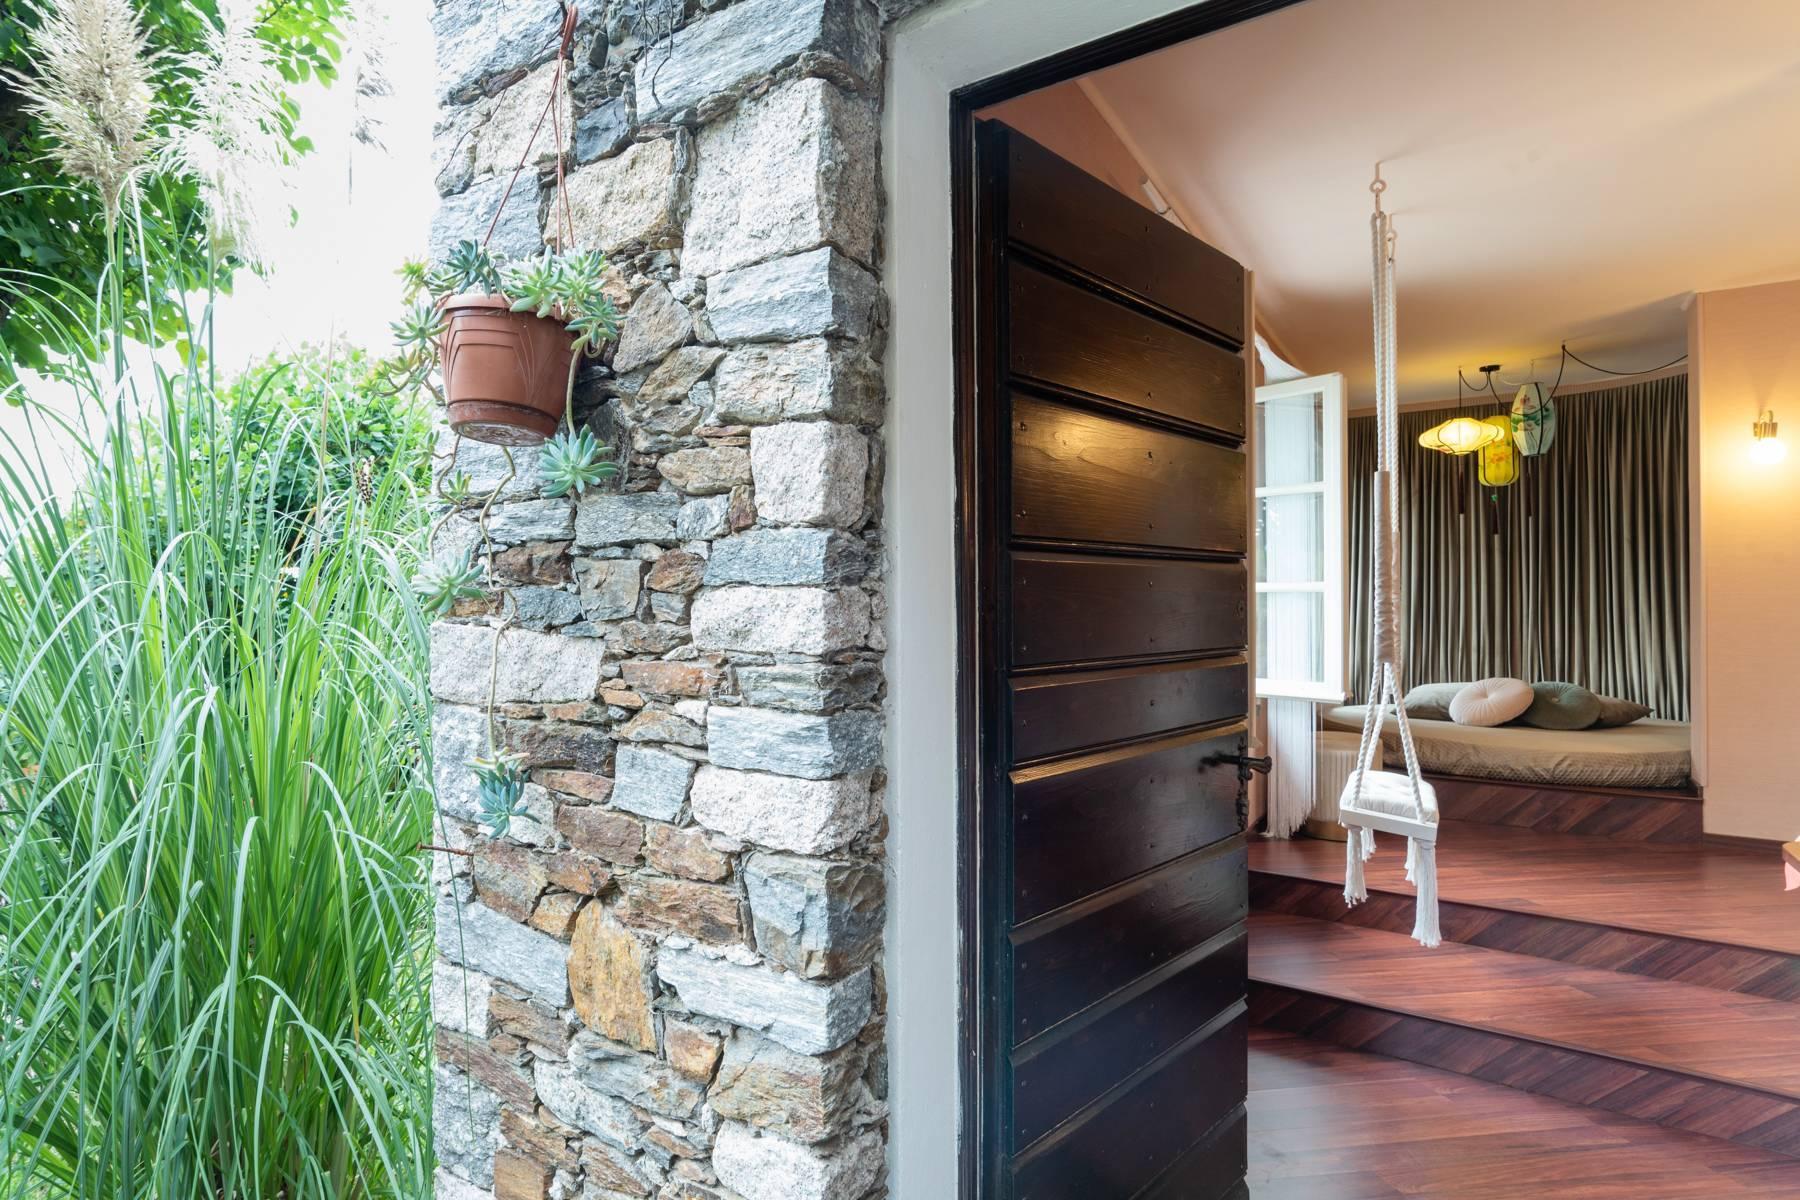 Elegant apartment in the small hamlet of Belgirate - 4